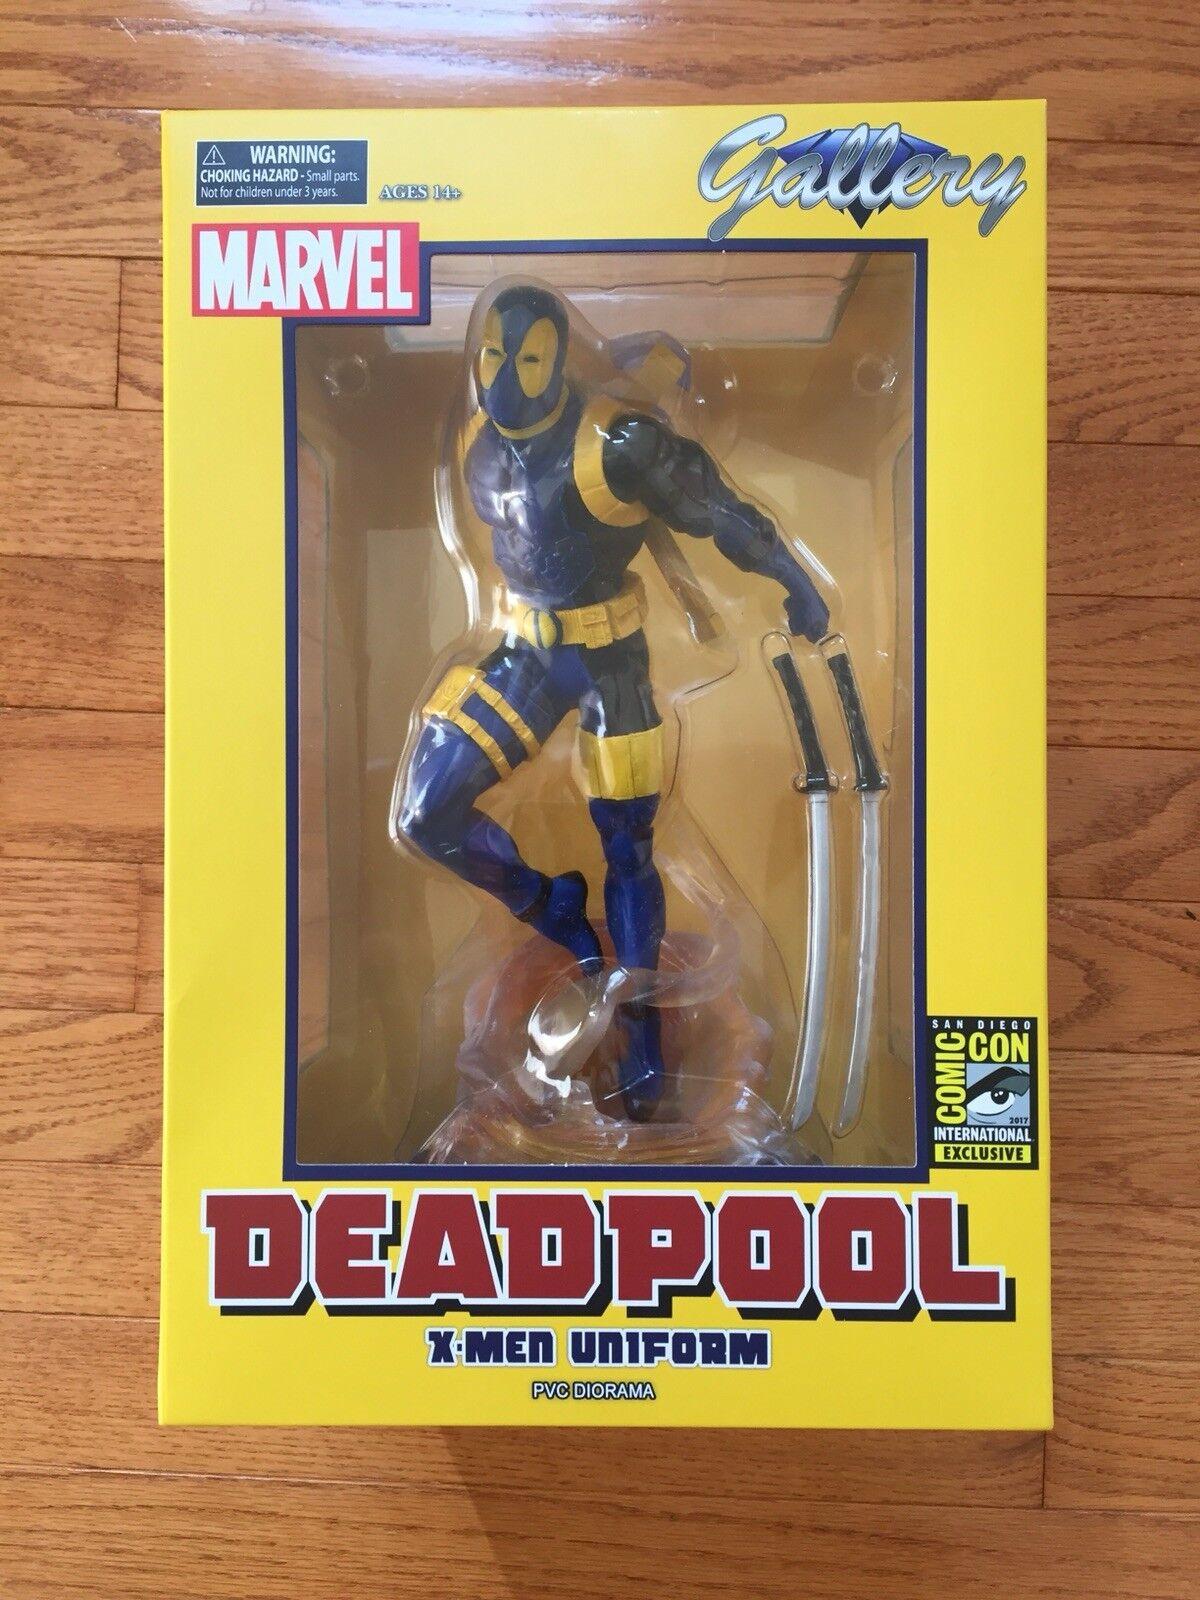 Marvel Gallery Deadpool X-Men Uniform PVC Diorama SDCC 2017-New in Box